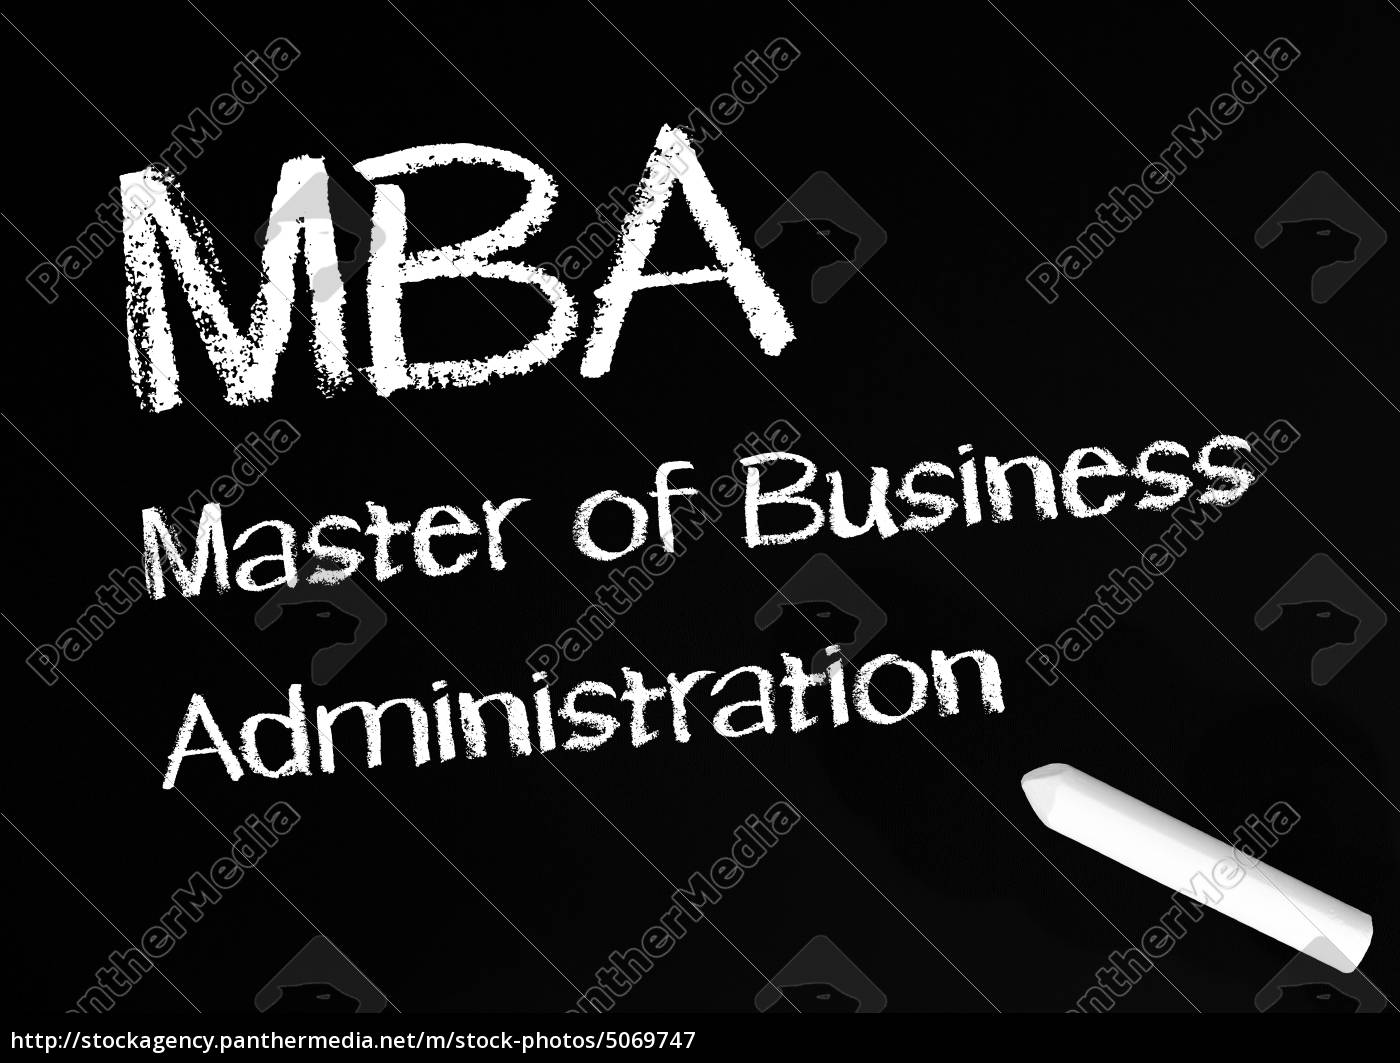 MBA - Master of Business Administration - Lizenzfreies Bild ...